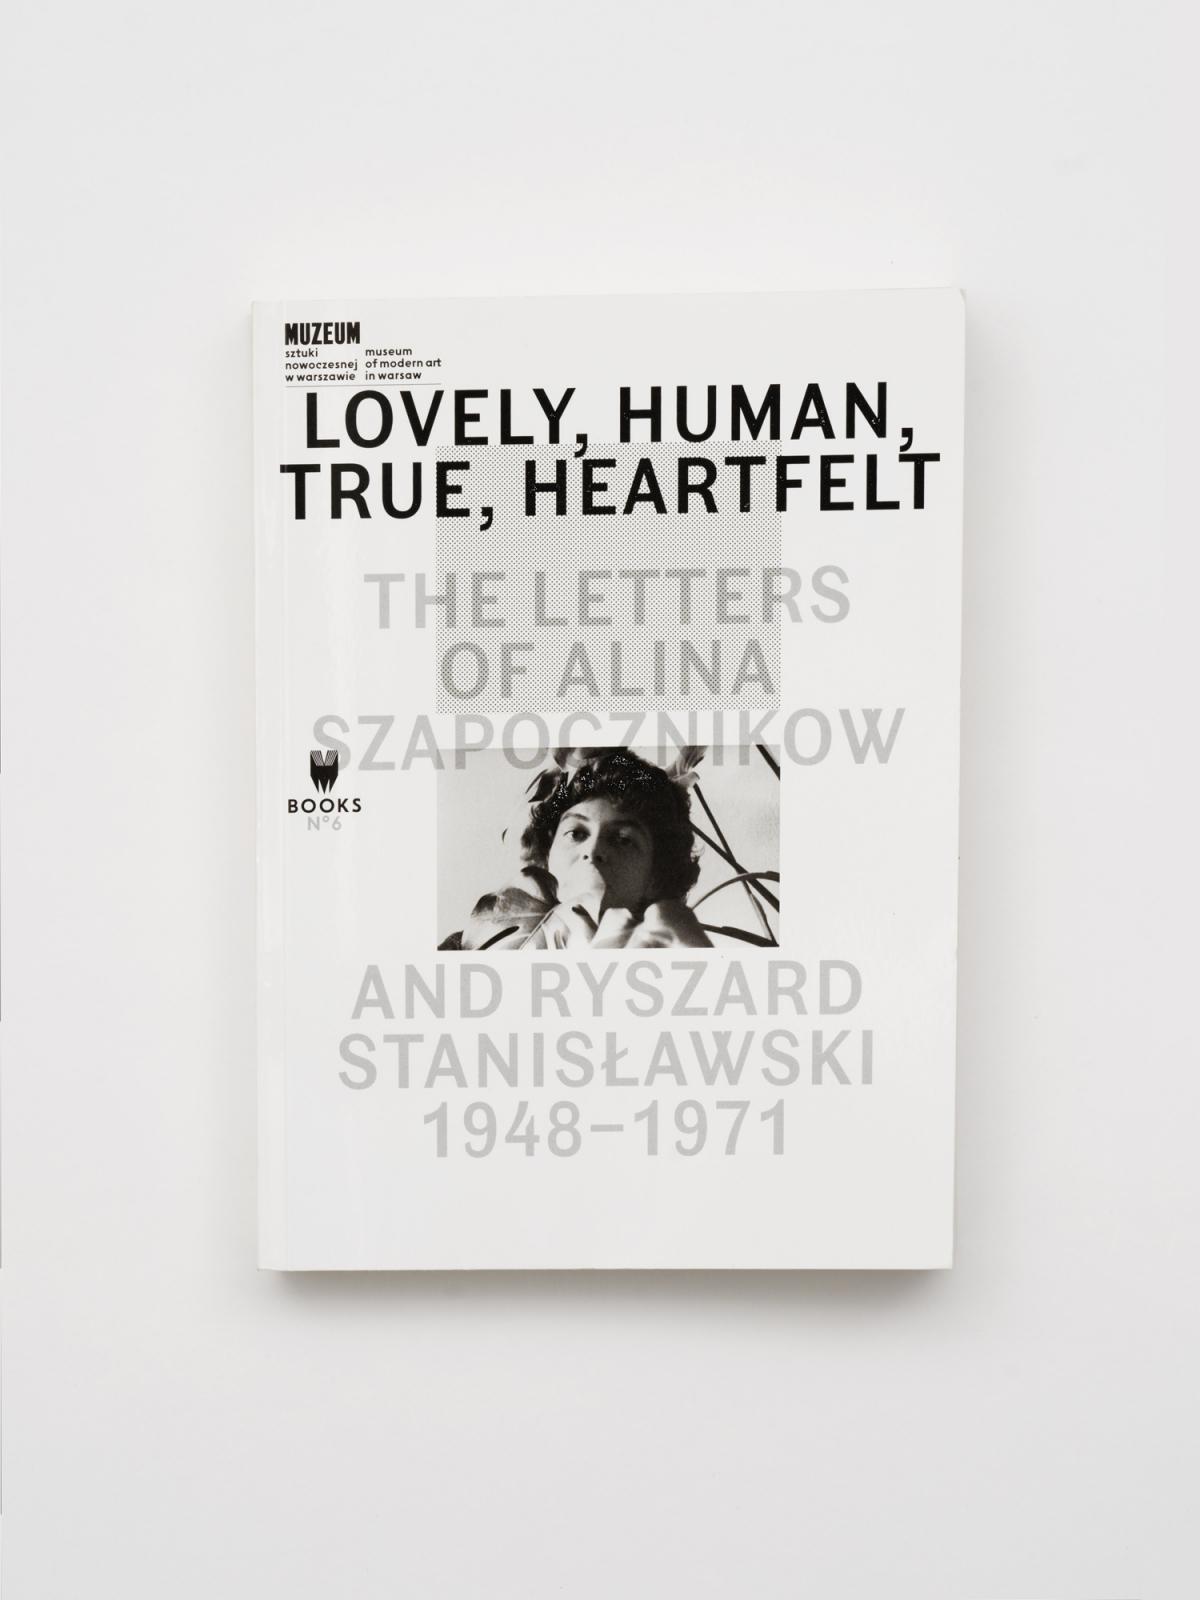 Lovely, Human, True, Heartfelt - The letters of Alina Szapocznikow and Ryszard Stanisławski - 1948-1971